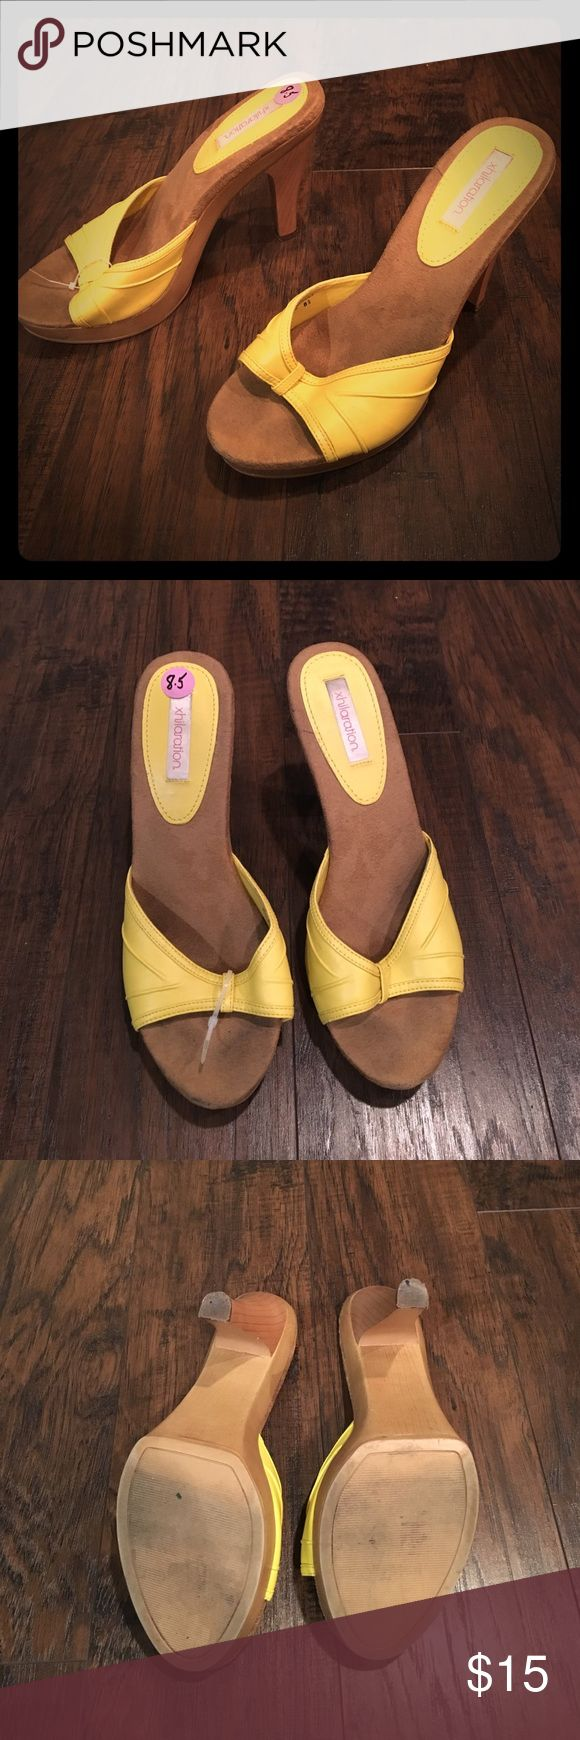 Yellow slipper heels Yellow slipper heels by Xhiliration. Size 8.5. Never worn! Xhilaration Shoes Slippers